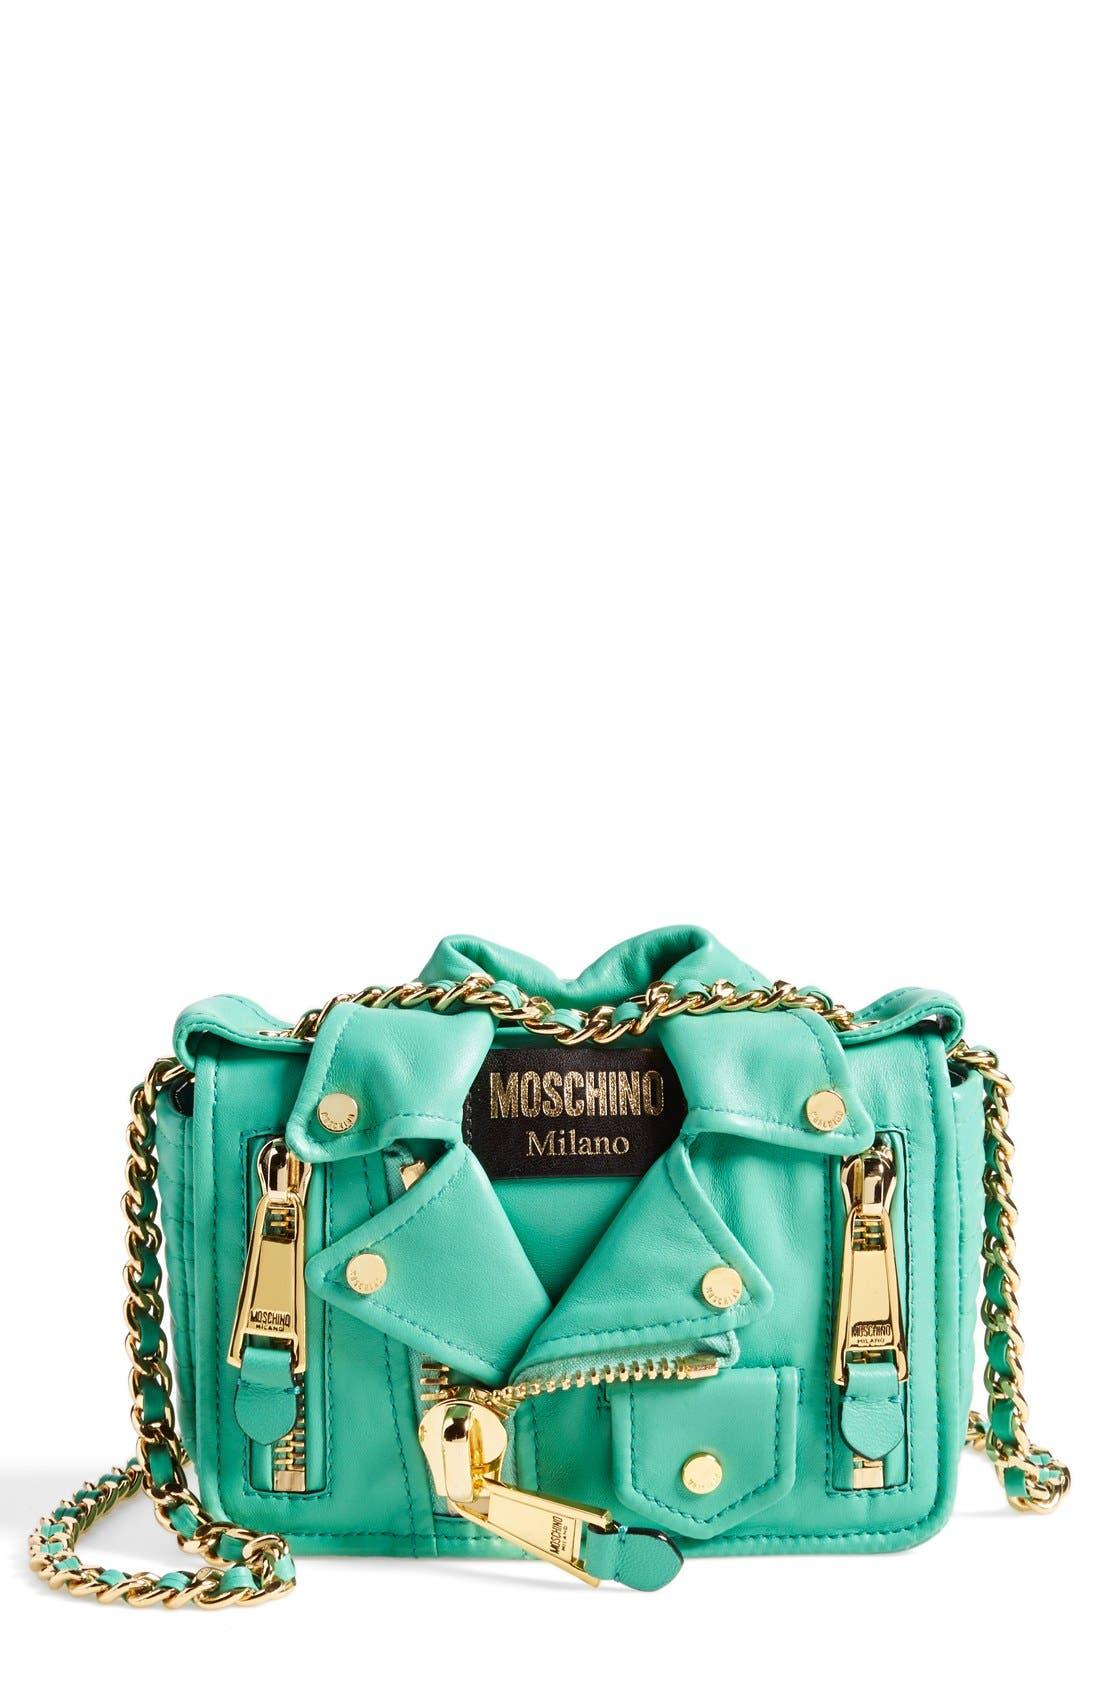 Alternate Image 1 Selected - Moschino 'Mini Leather Jacket' Crossbody Bag